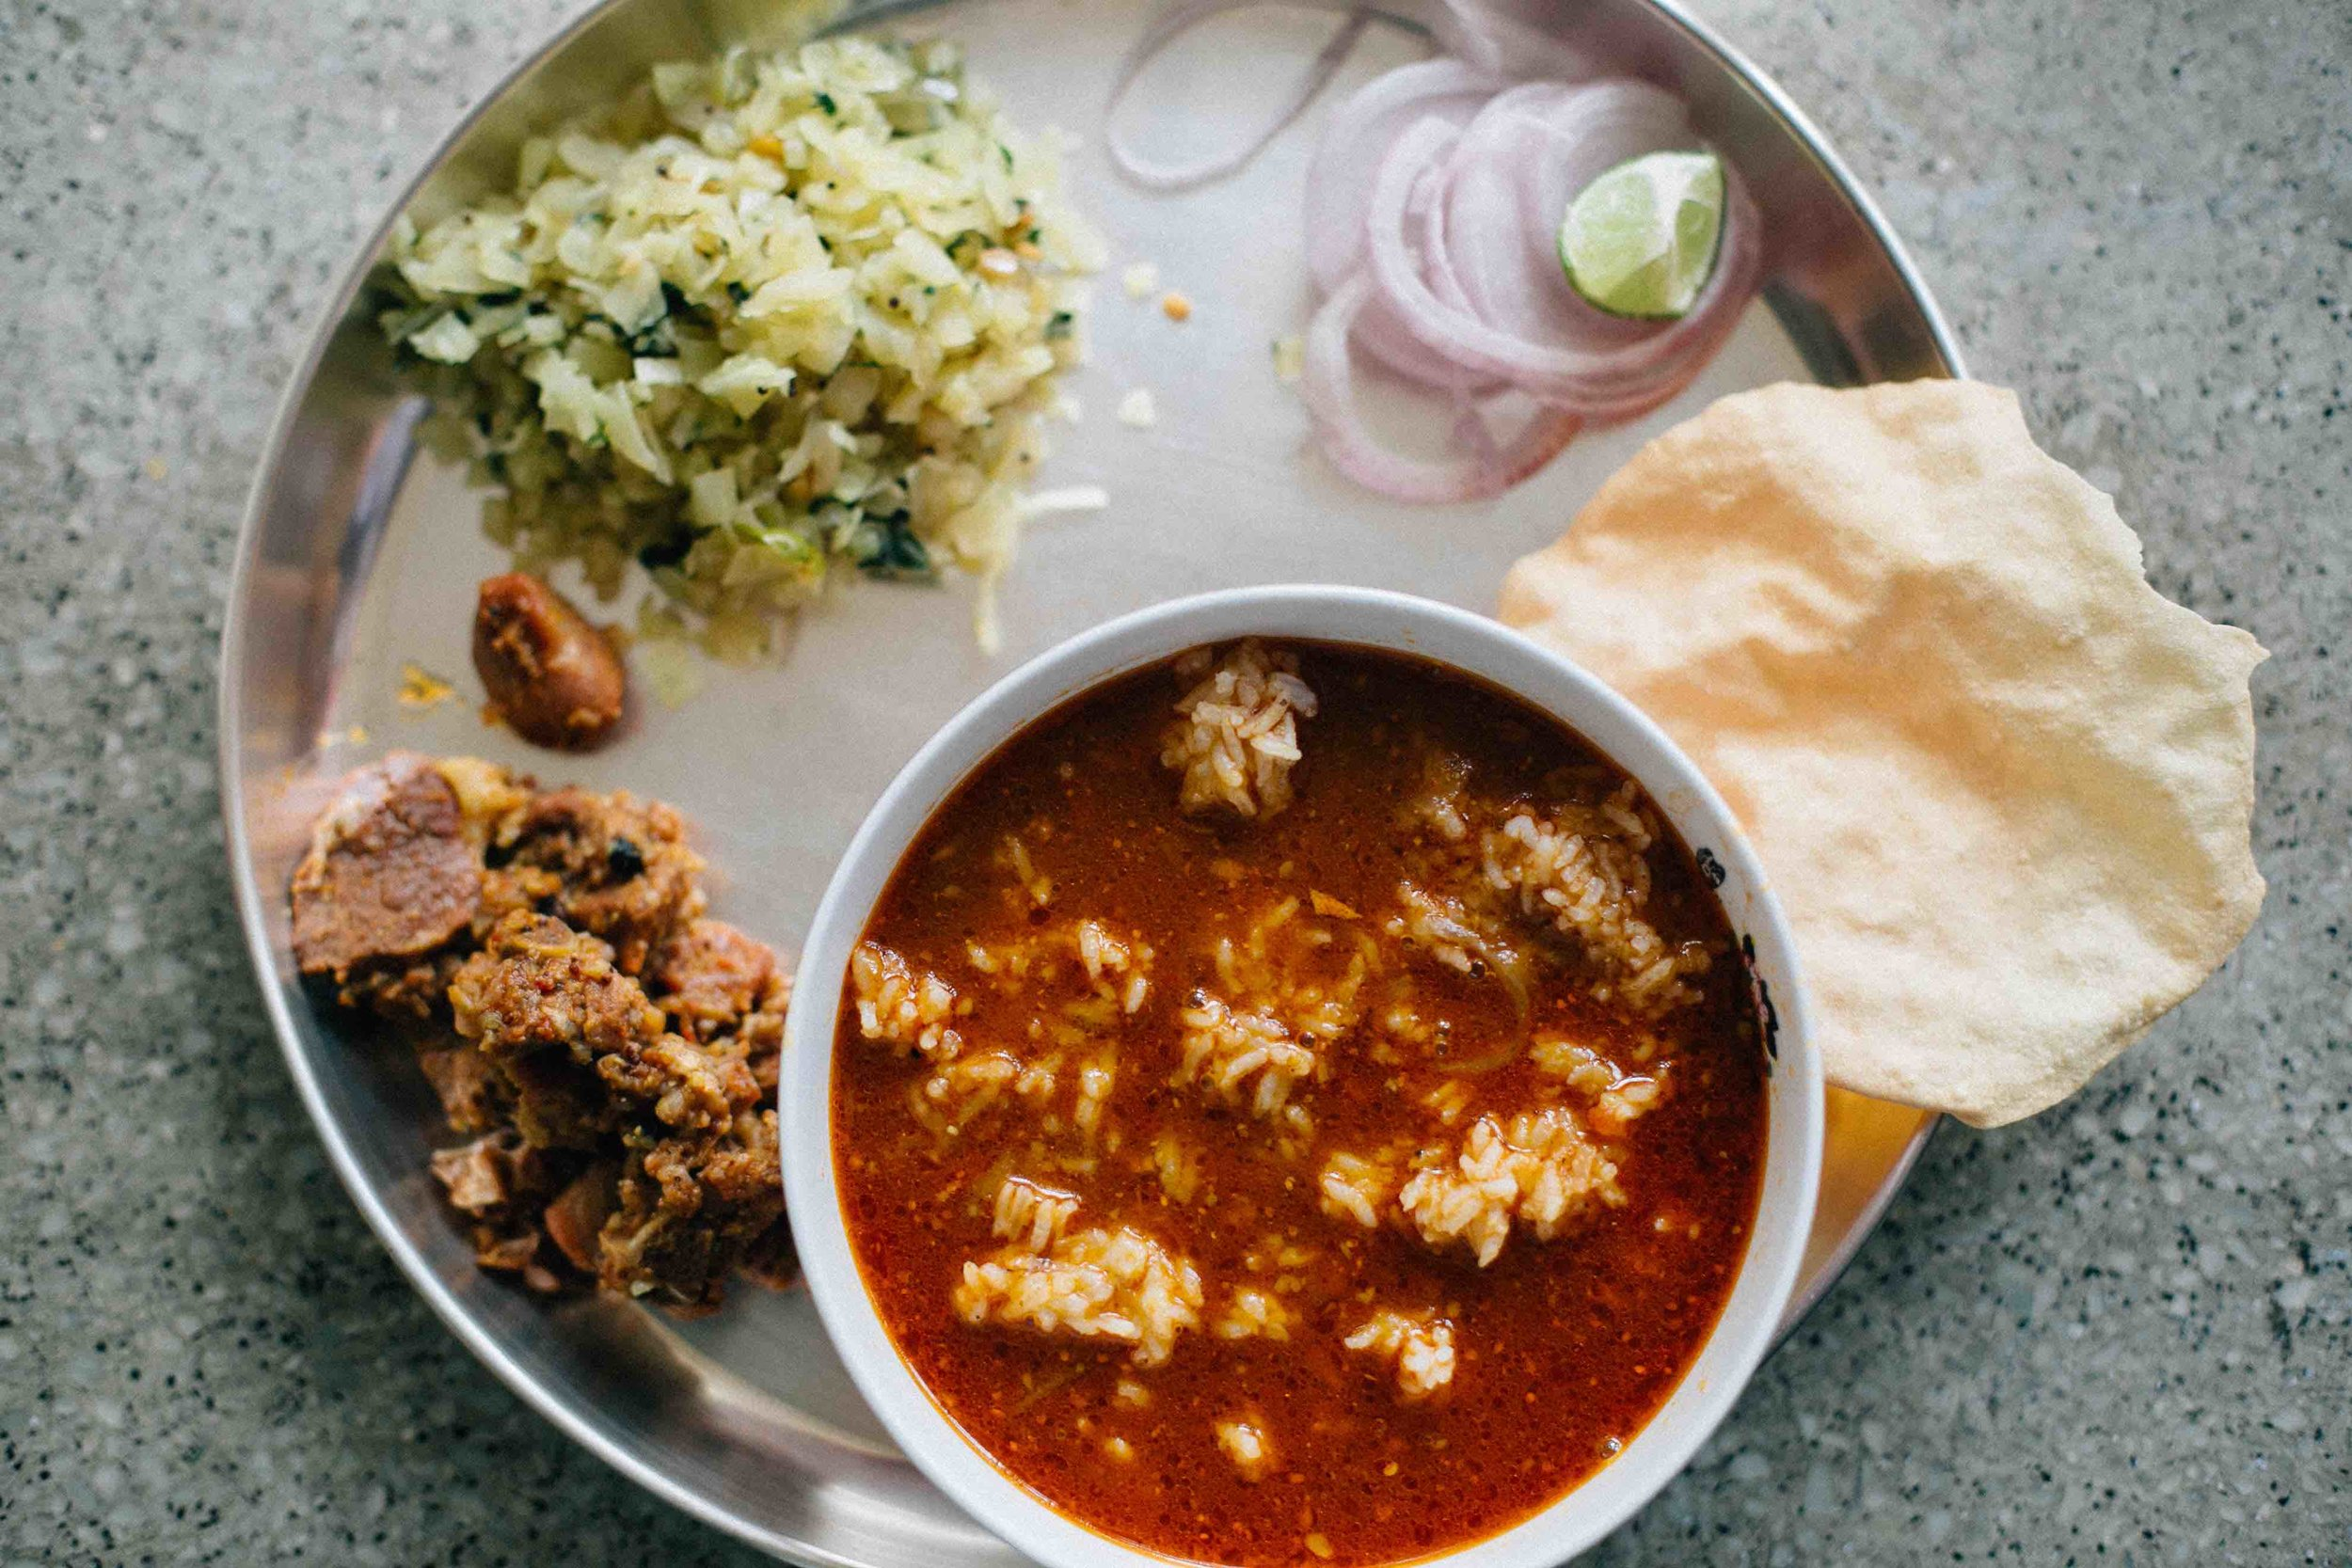 Ceylon curry recipe or mutton rasam for #1000Kitchens | Arathy Madappa, Bangalore